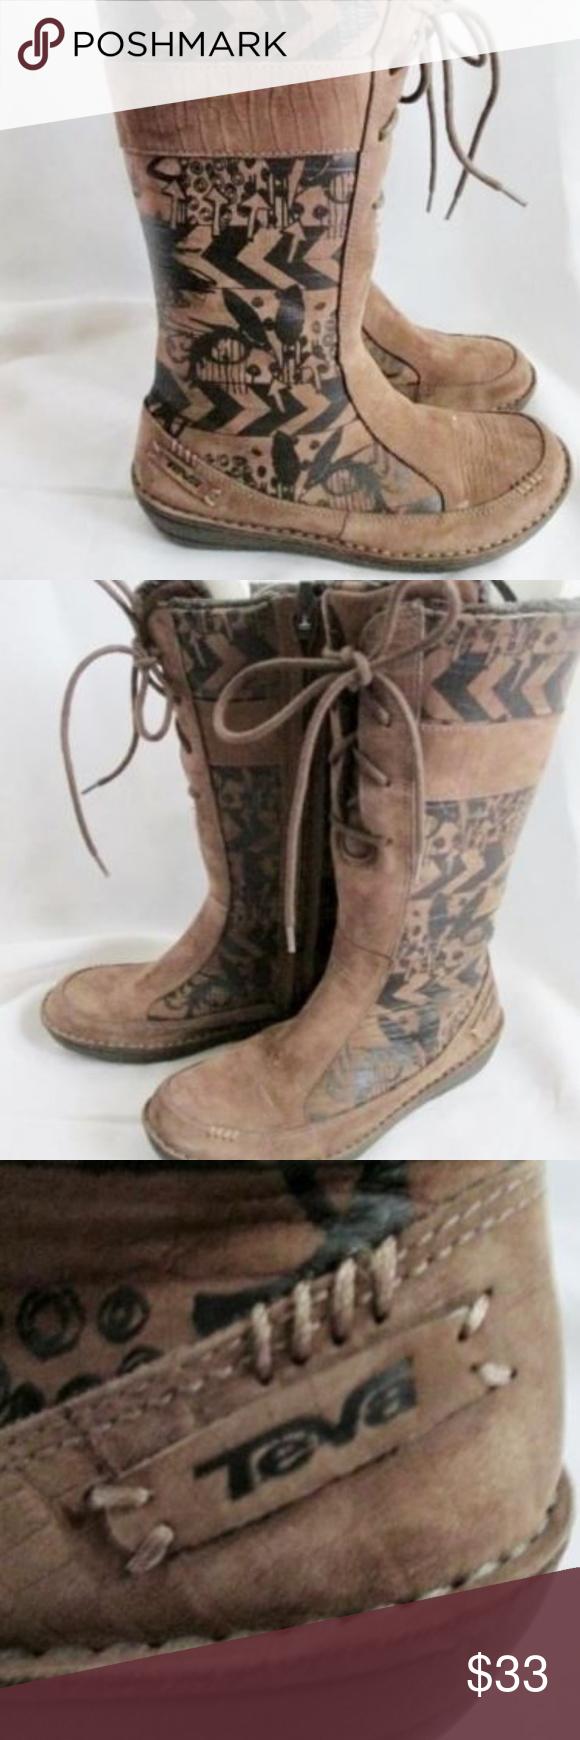 f24d548a7e491c Womens TEVA KIRU 4058 Suede Leather BROWN 8 TATTOO Gorgeous pair of womens  ladies Teva Spider